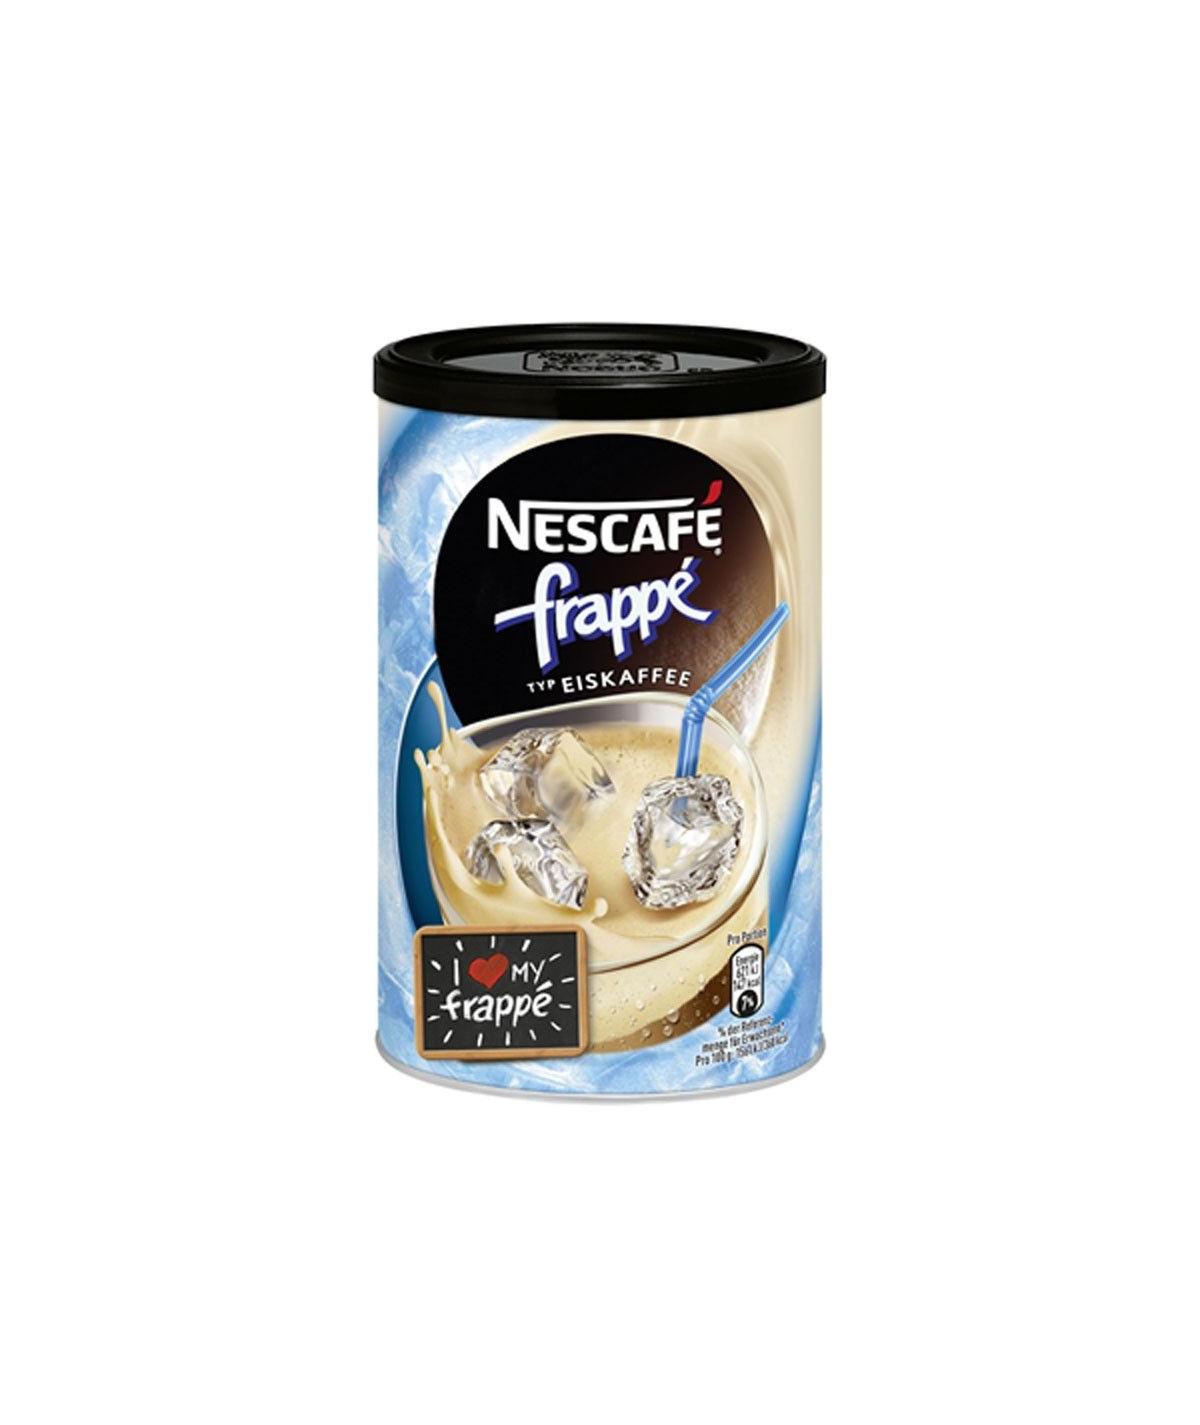 Frappé Typ Eiskaffee Instant Nescafé 275g